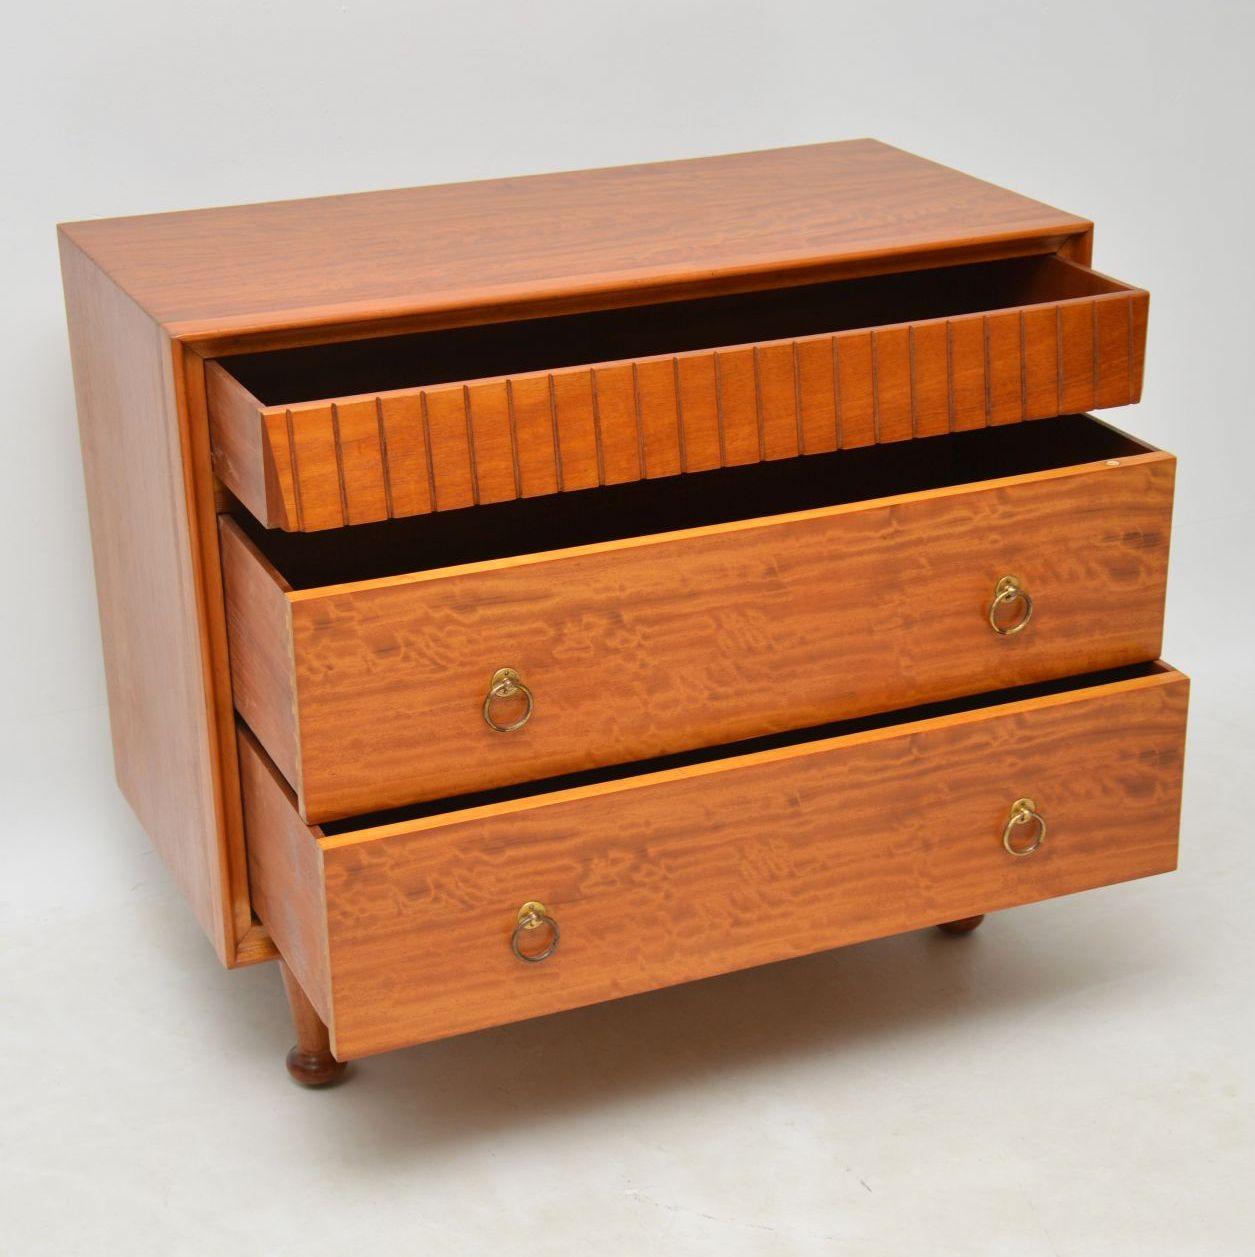 retro_vintage_satinwood_heals_chest_of_drawers_8